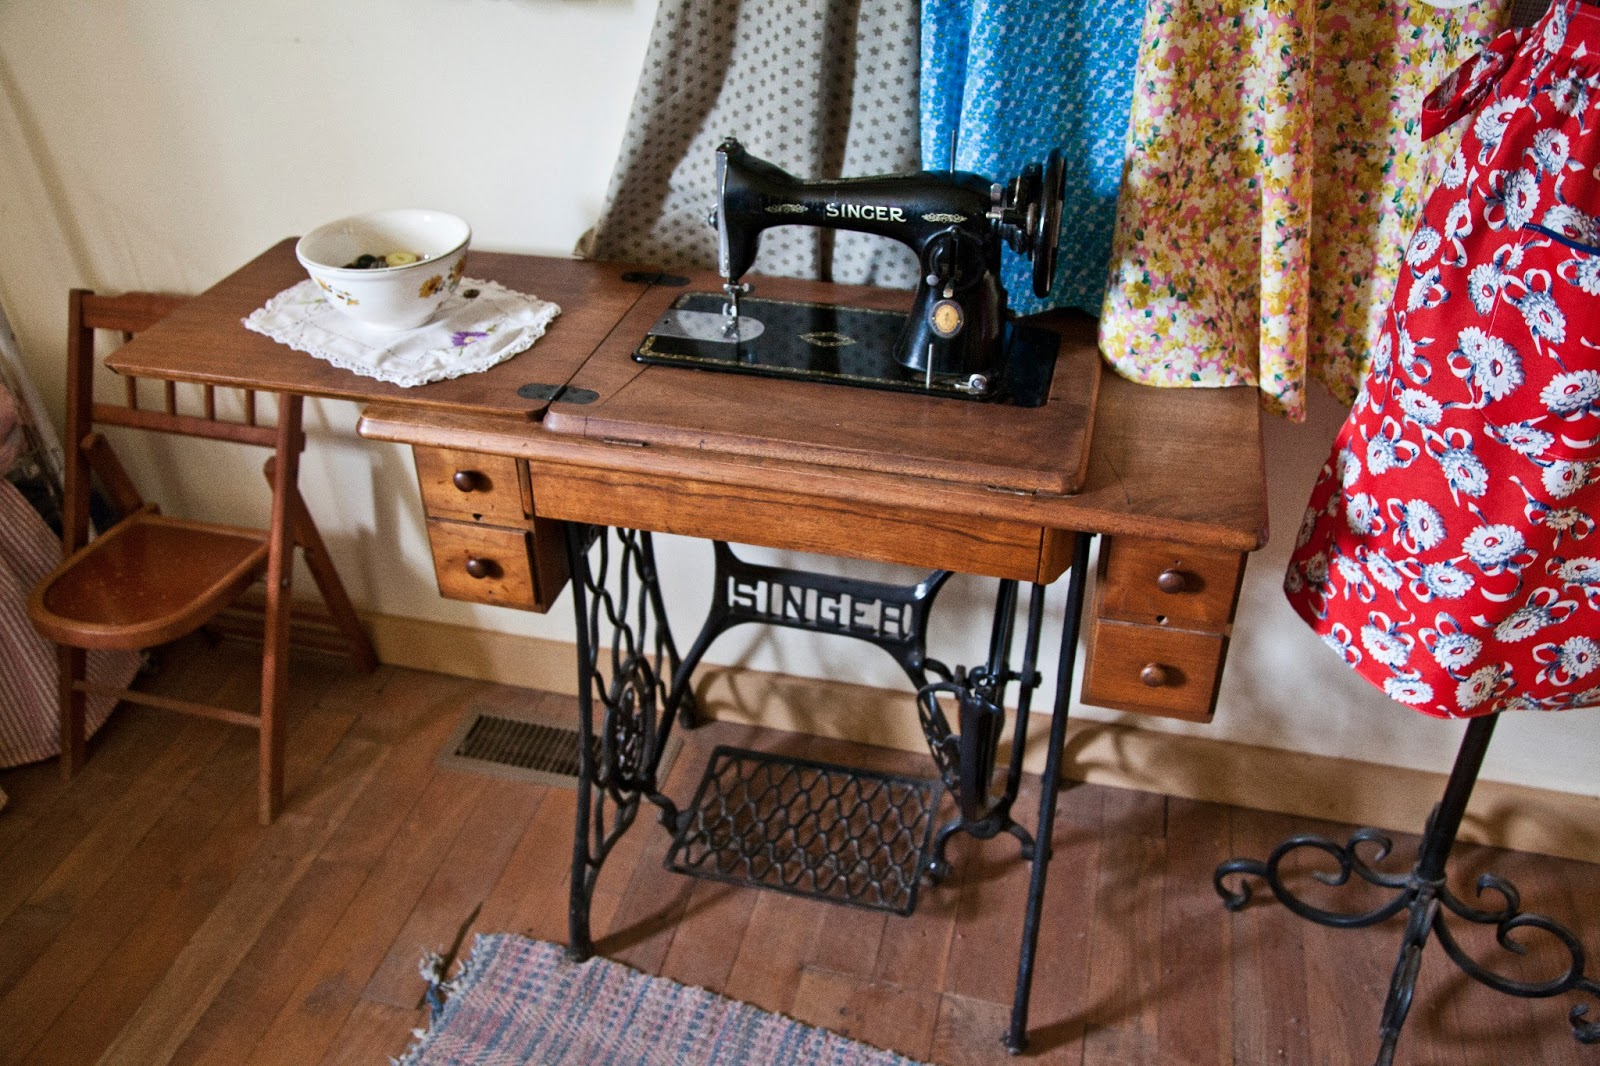 singer trendle sewing machine